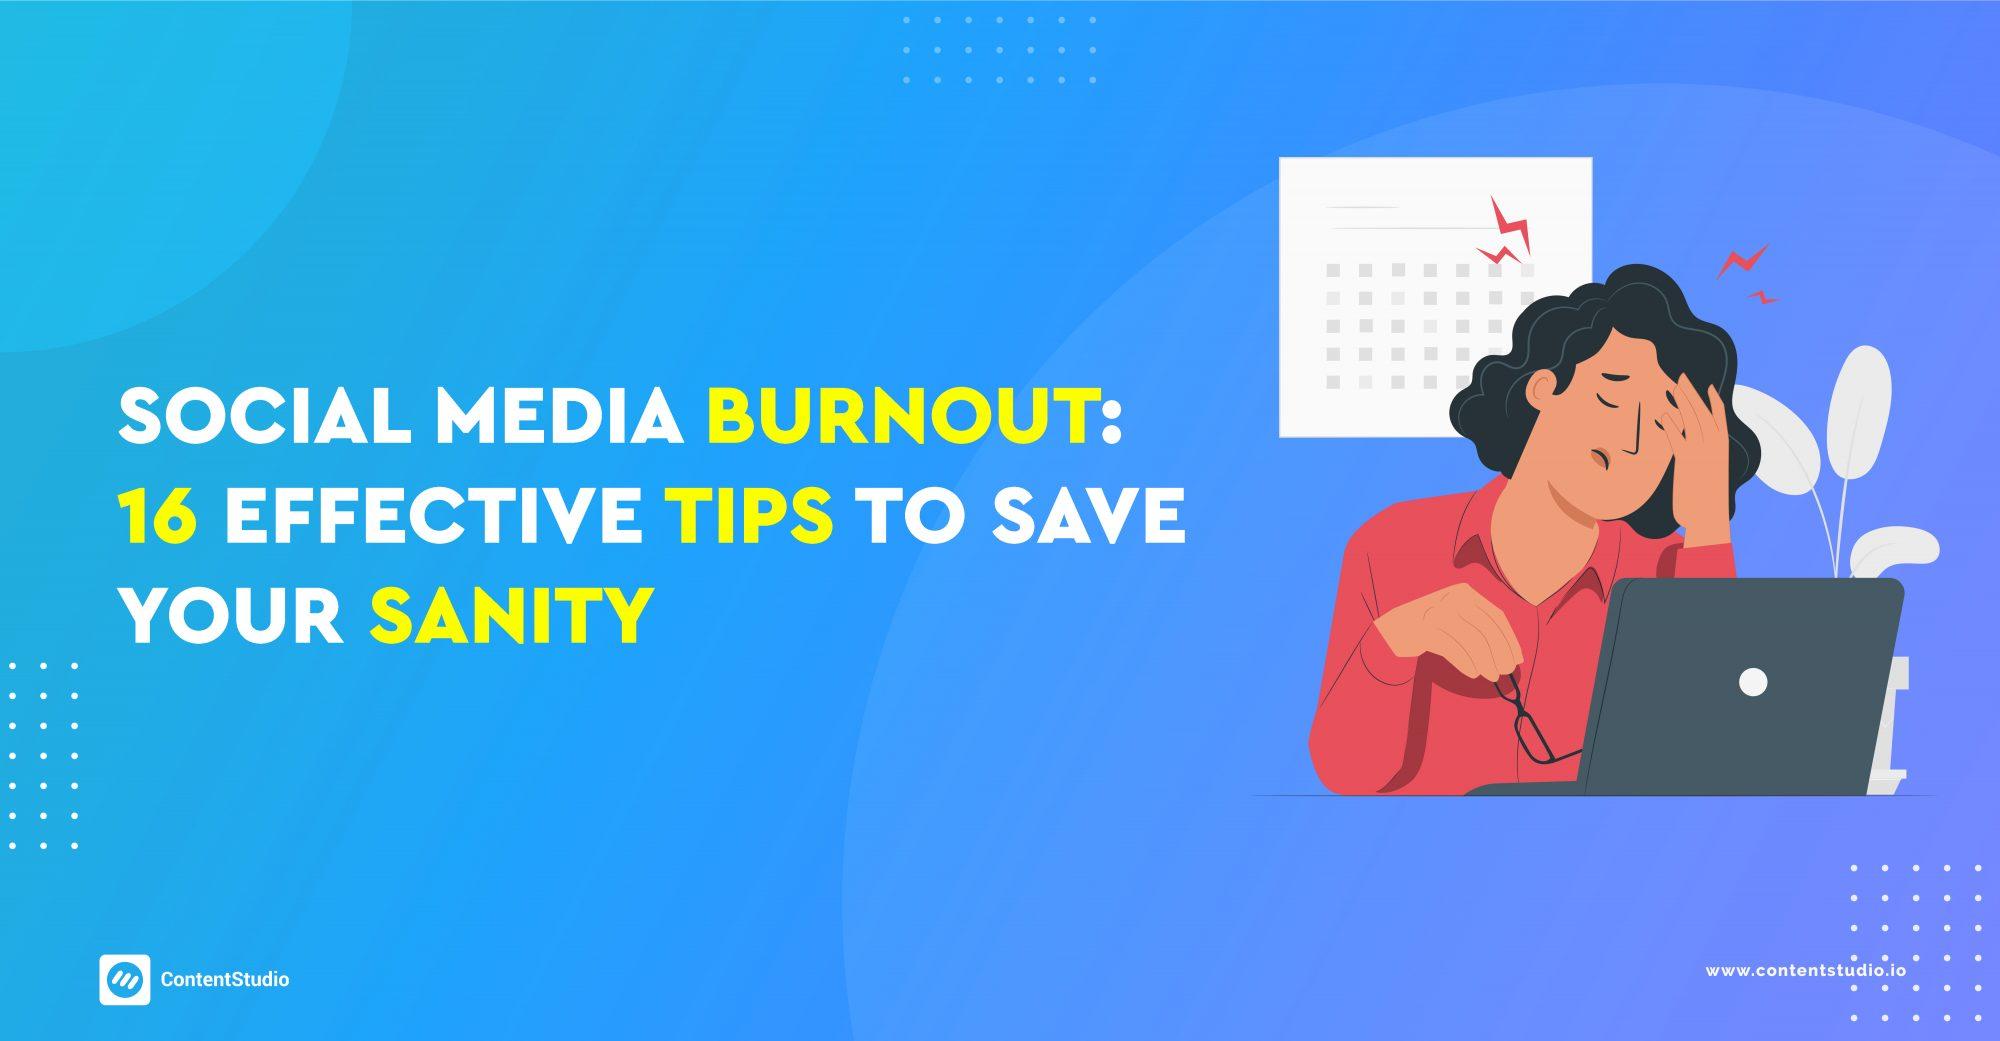 Social media burnout- tips to save sanity